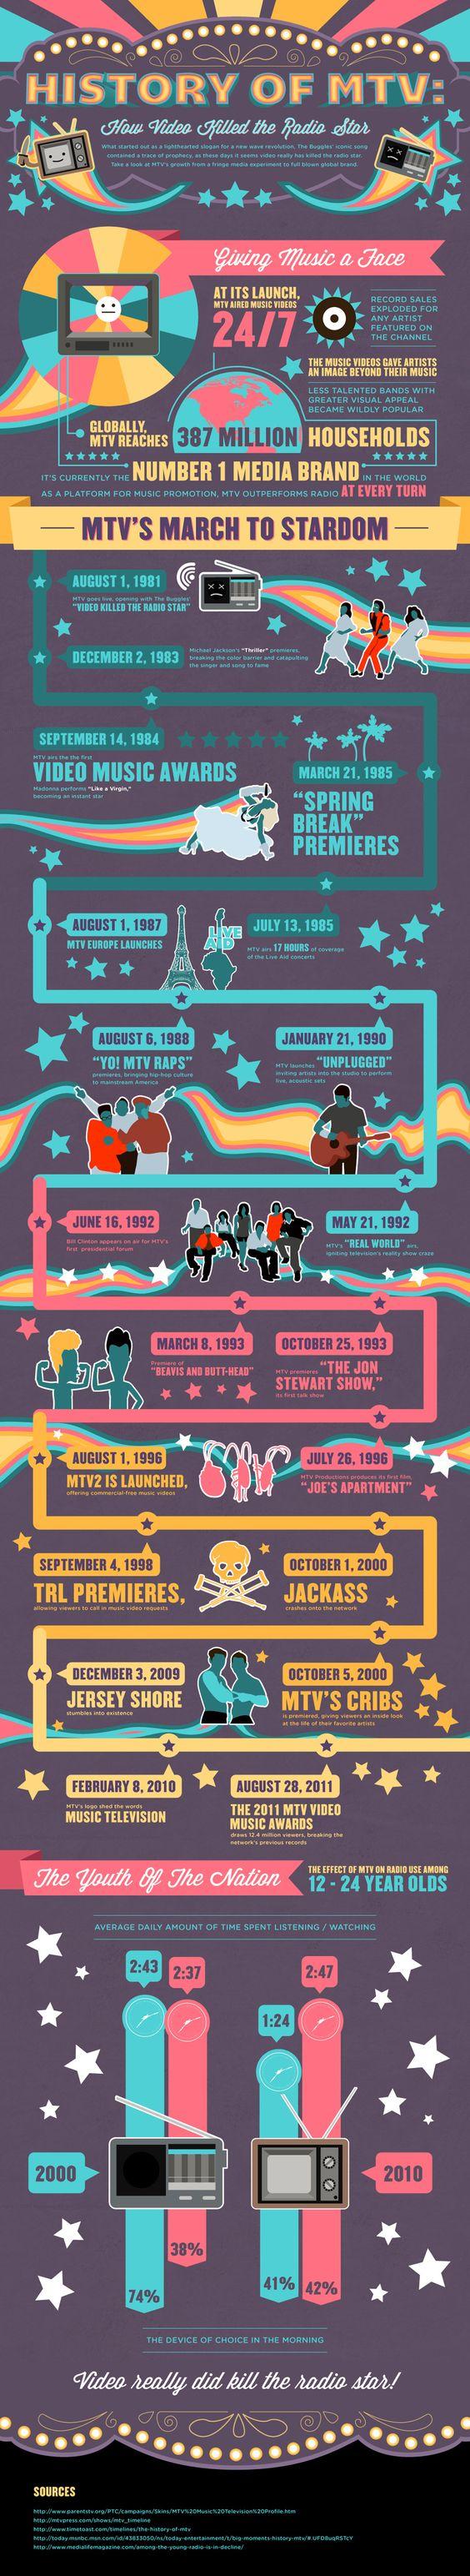 History of MTV